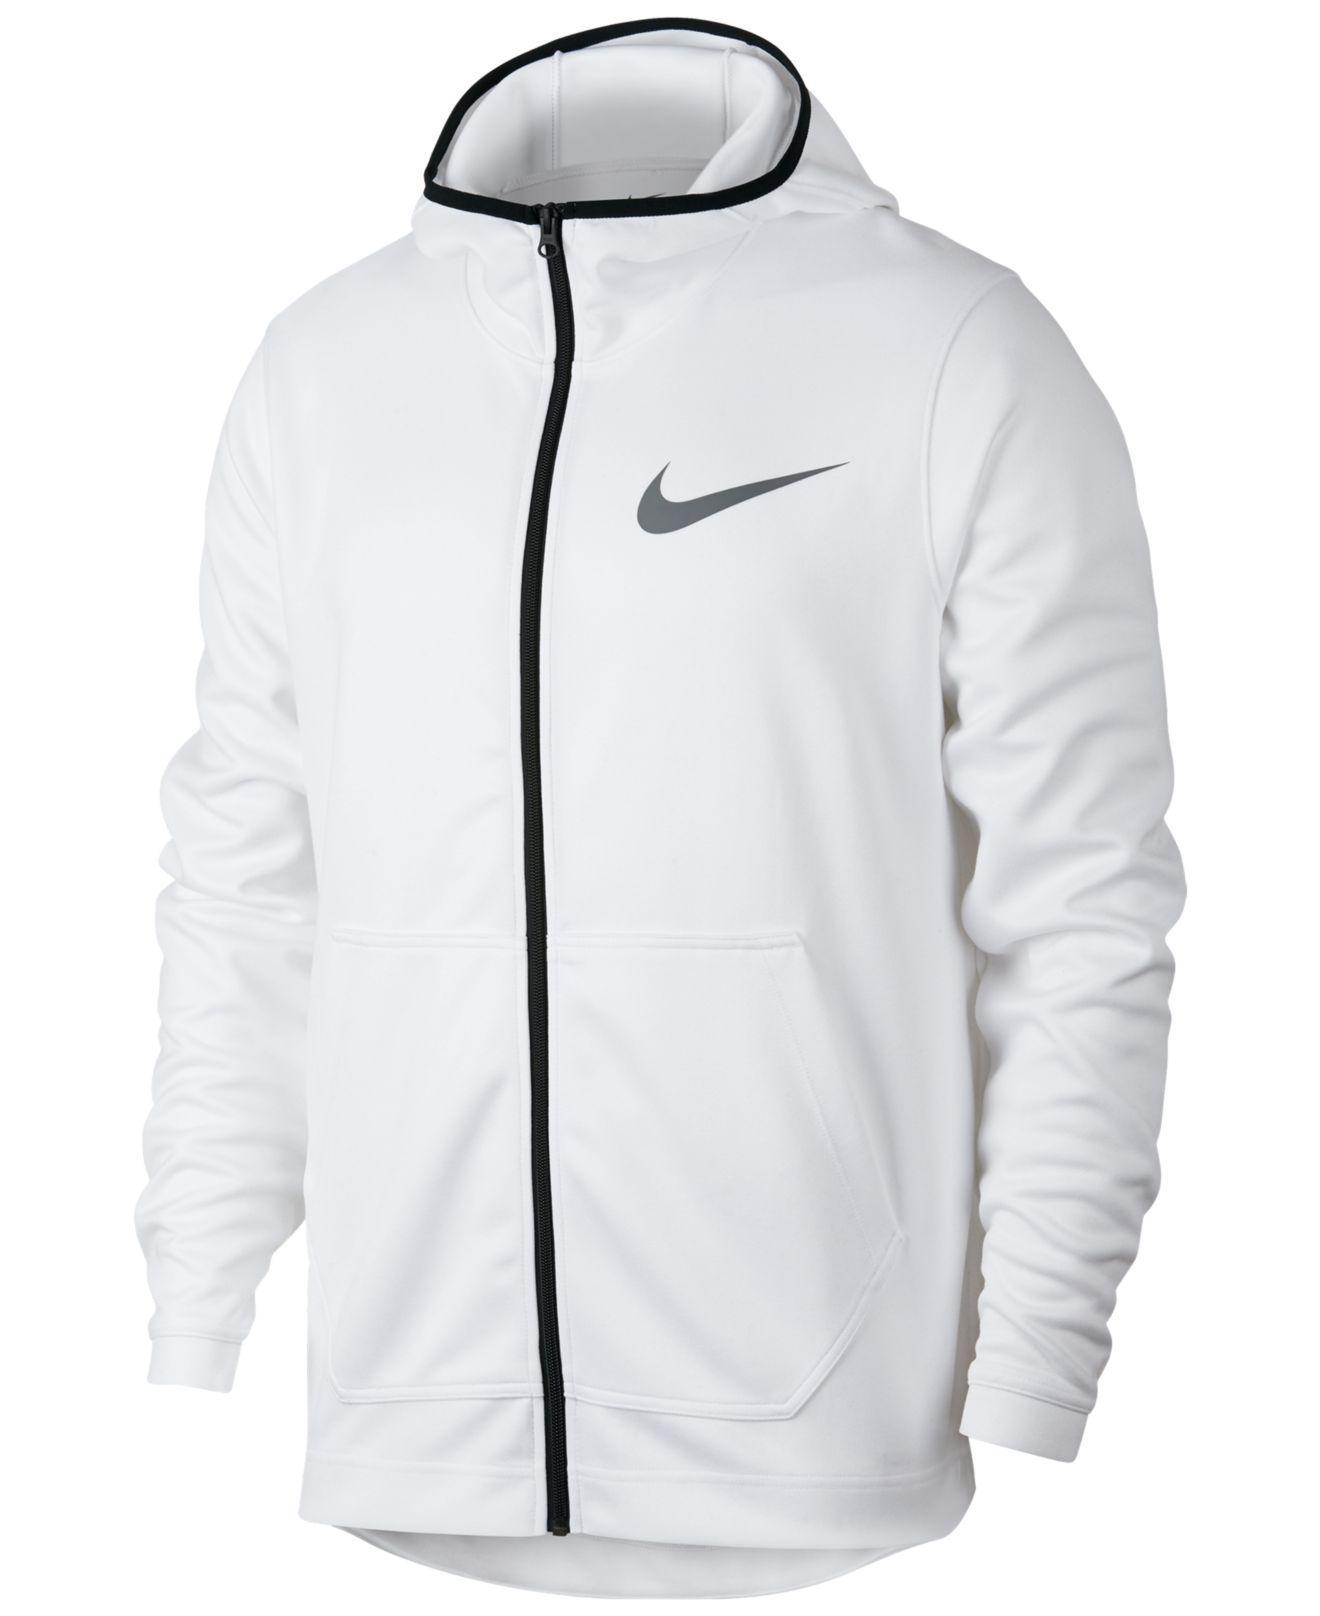 494a1e93 ... Nike - White Spotlight Dri-fit Zip Hoodie for Men - Lyst · Visit  Macy's. Tap to visit site